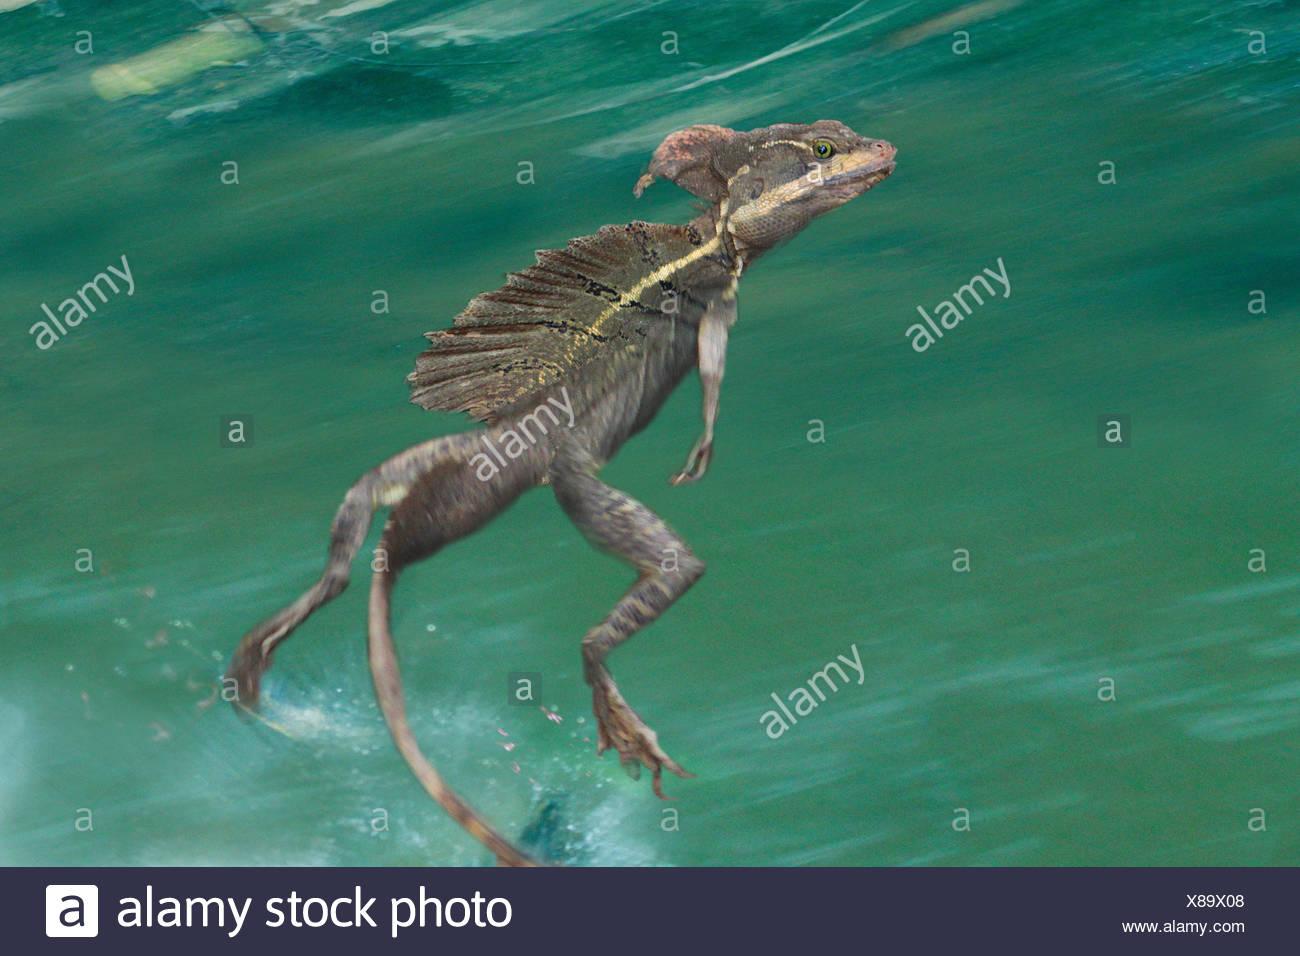 Brown basilisk Basilisk, rayas, rayas amarillas, Jesucristo lagarto Basilisk (Basiliscus vittatus), corriendo sobre el agua Foto de stock